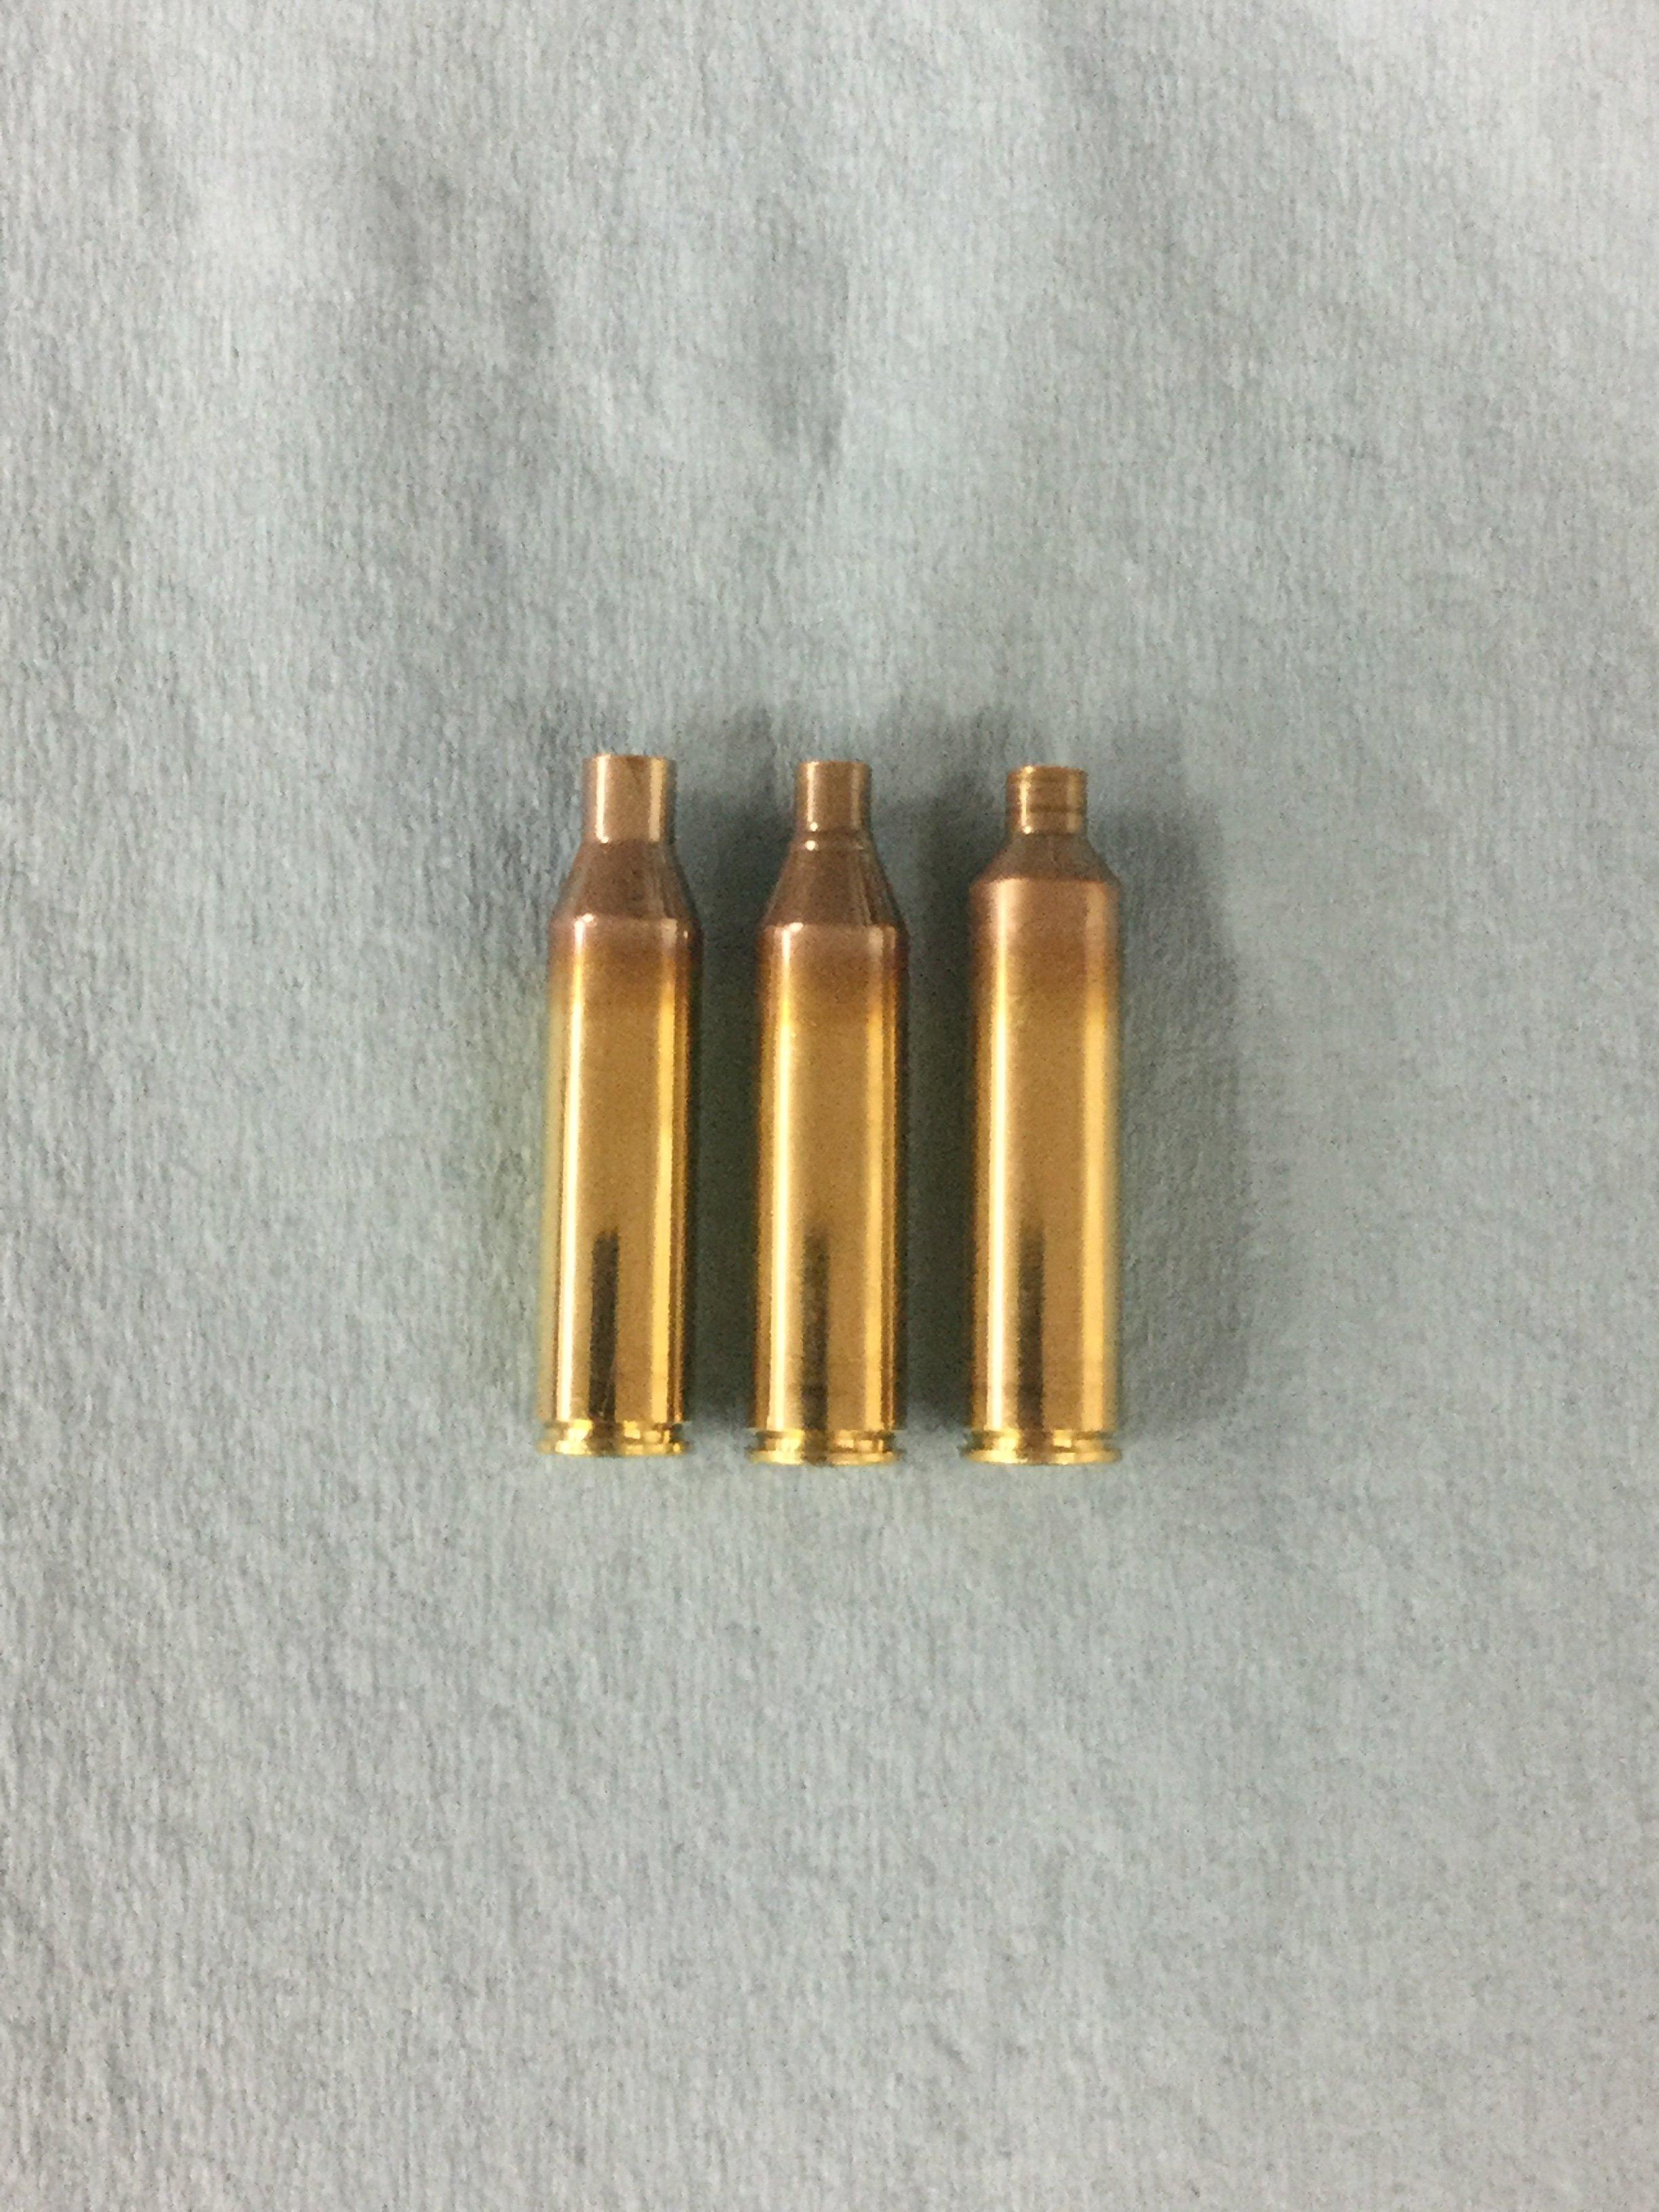 6D58FFF2-D19C-4487-9C54-49C01C1A16A4.jpeg